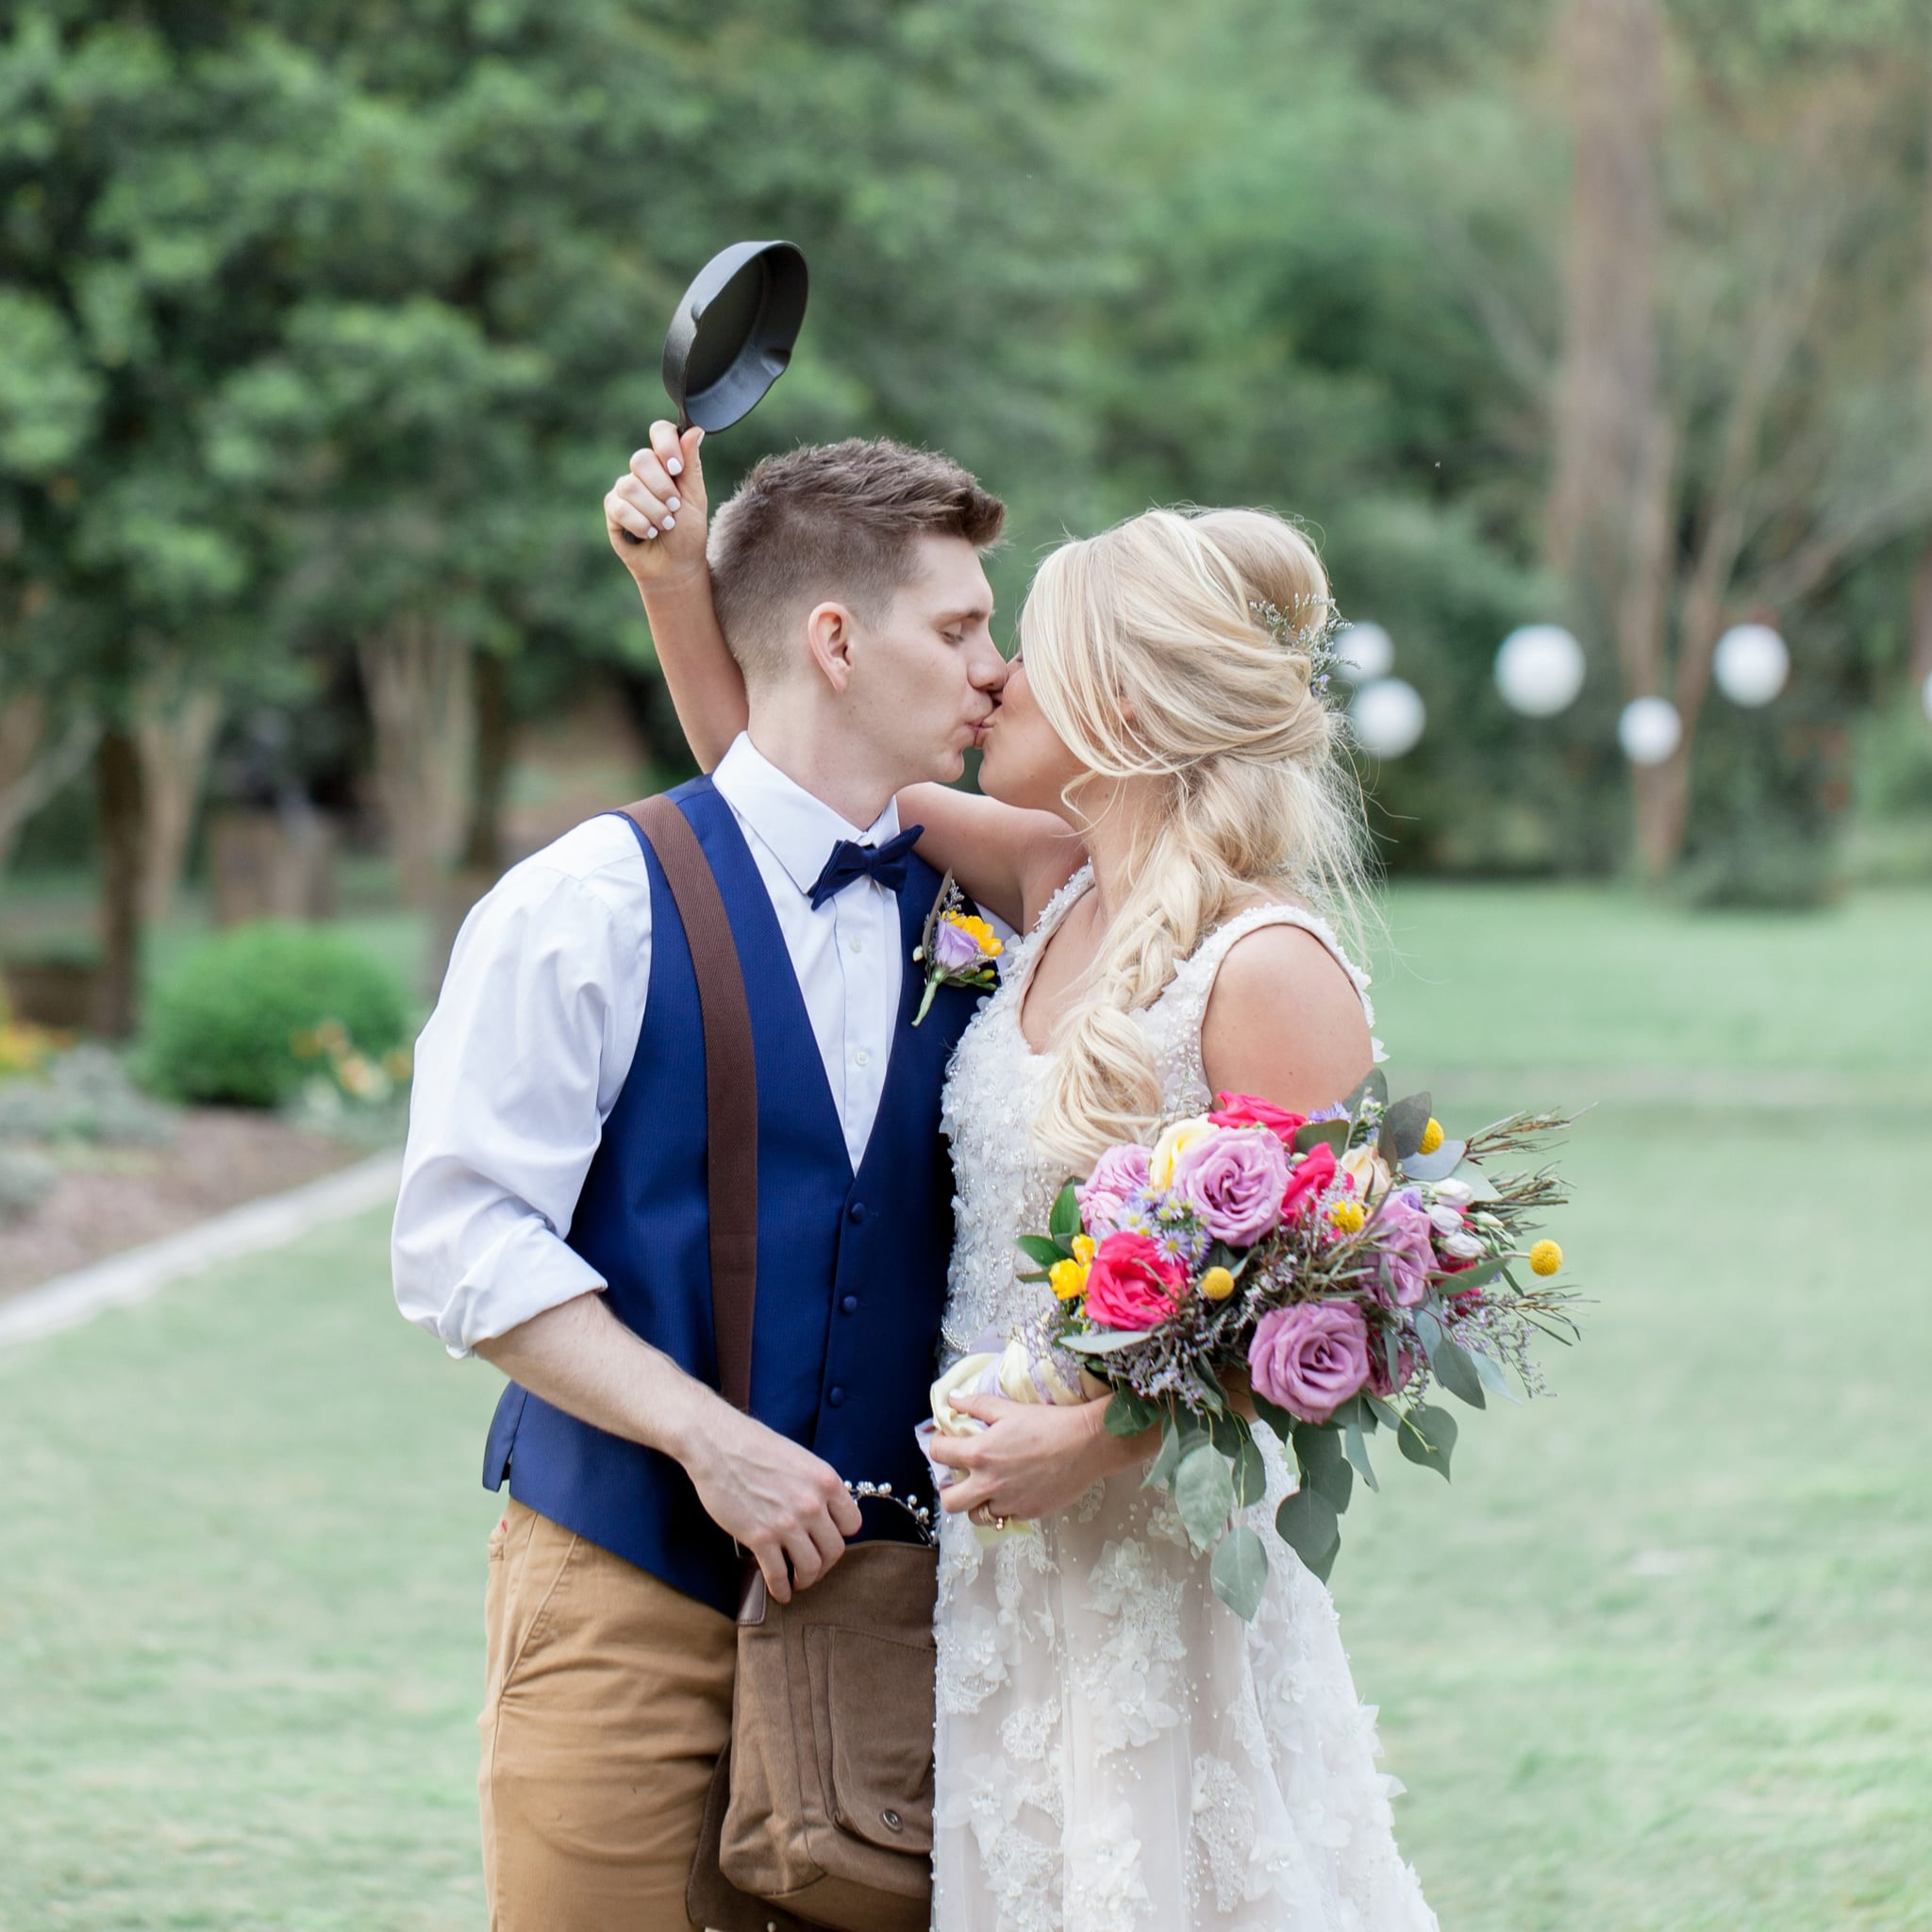 Disney S Tangled Movie Wedding Ideas Popsugar Love Sex